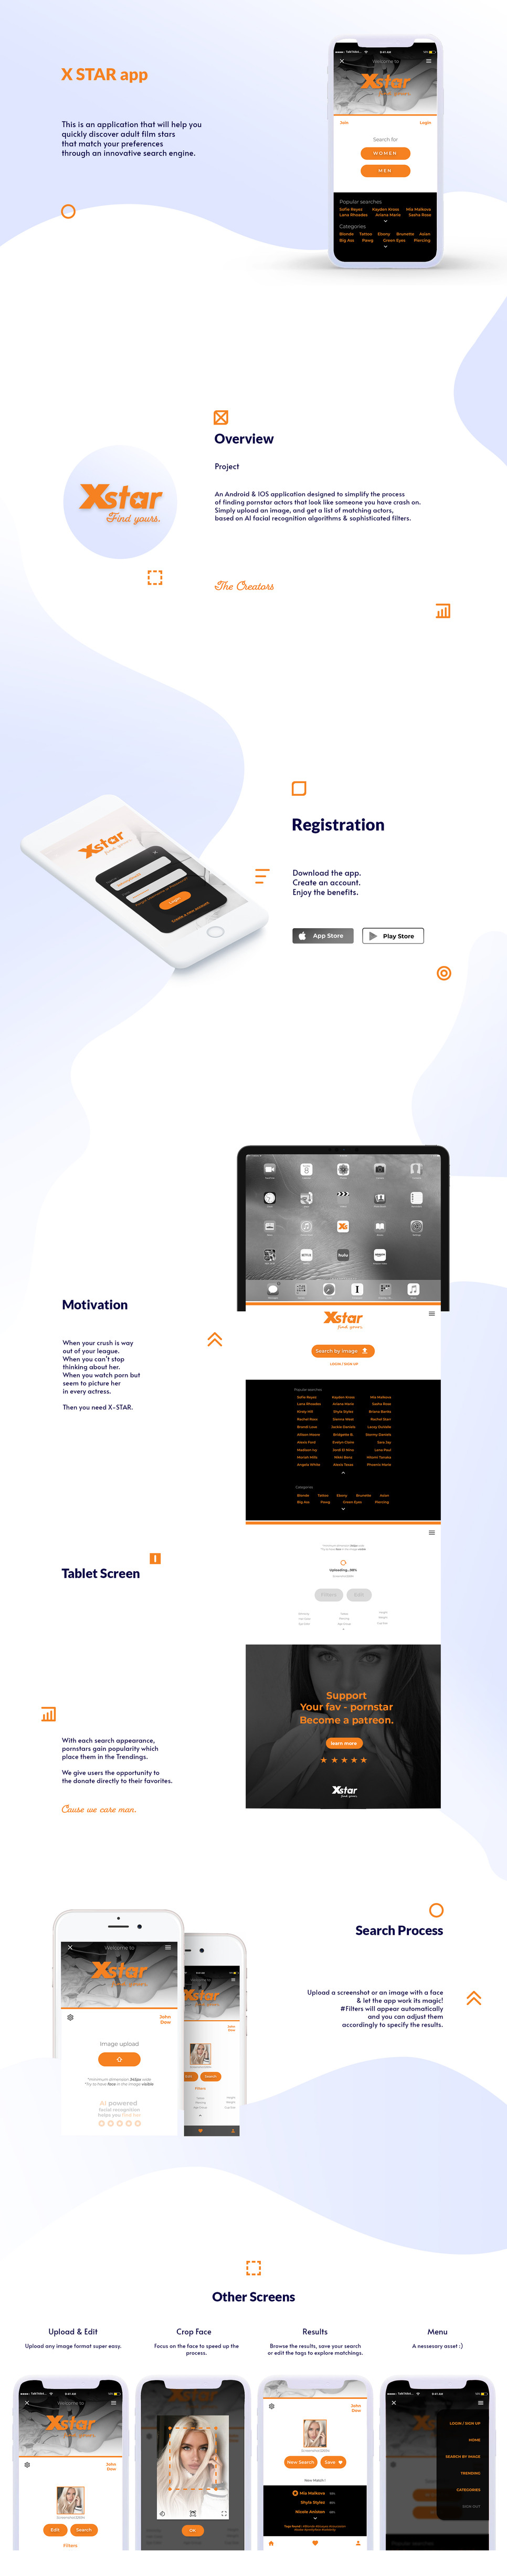 X-stars behance project.jpg